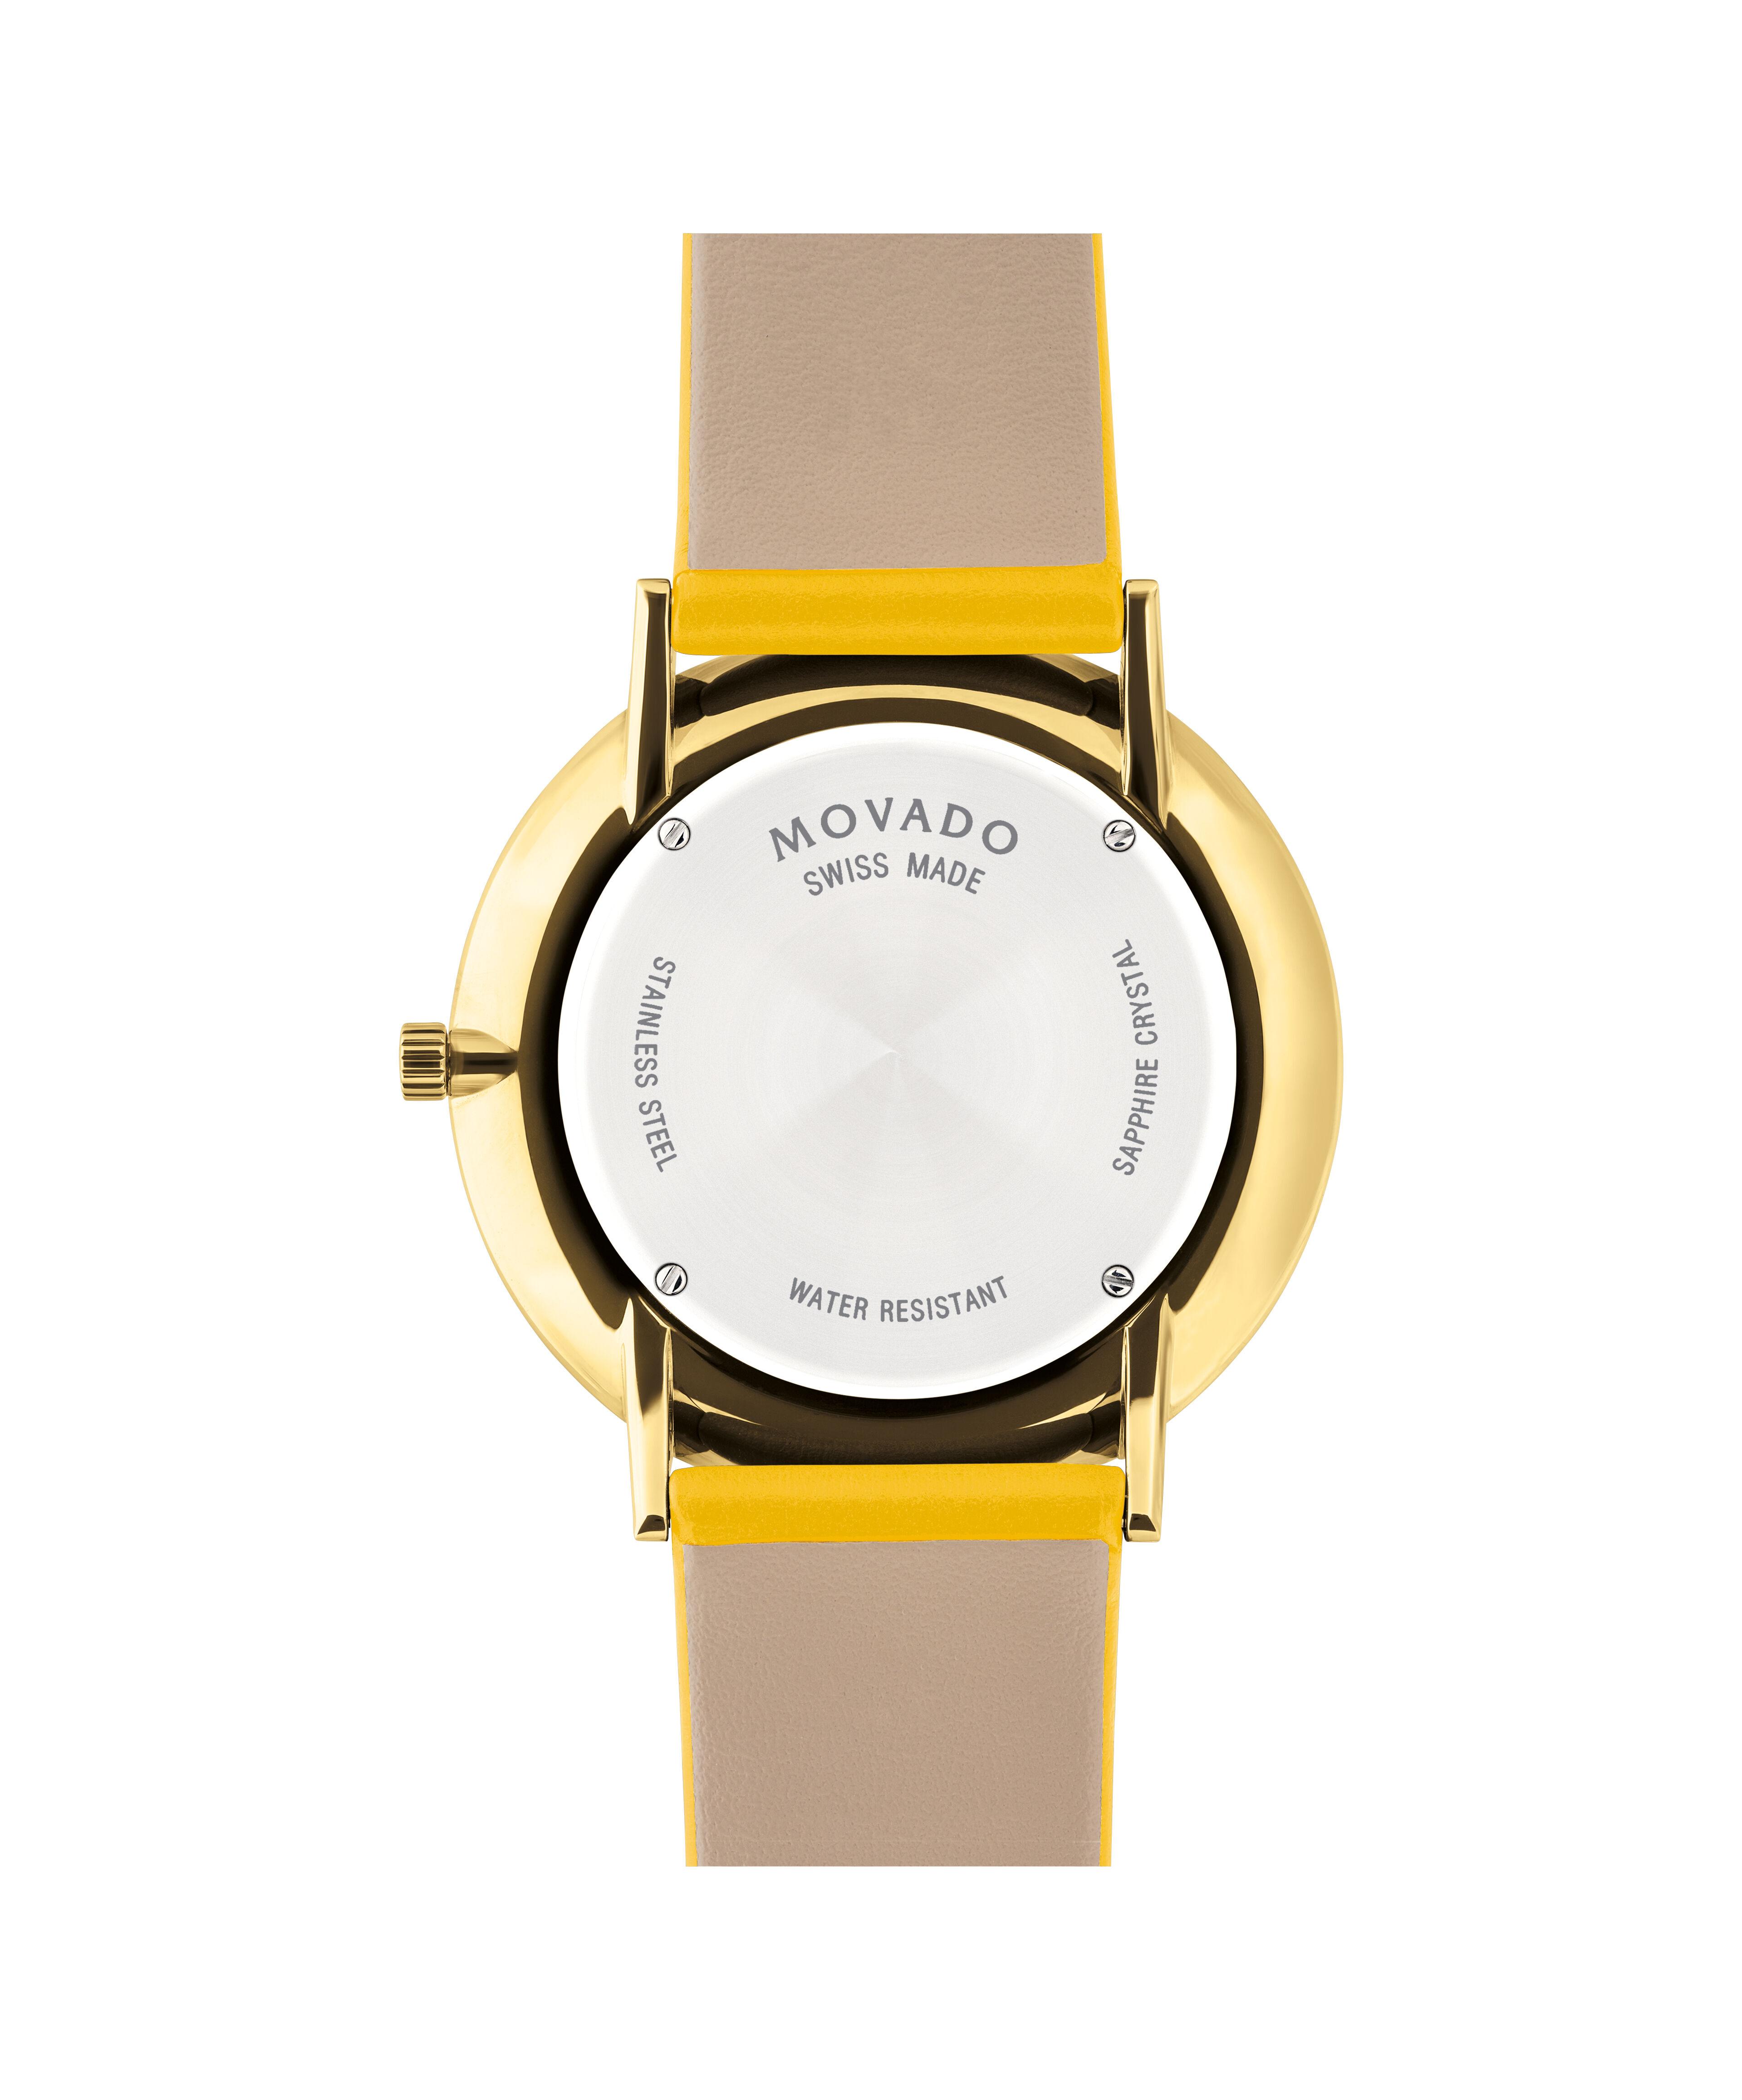 Omega Skeleton Watch Replica